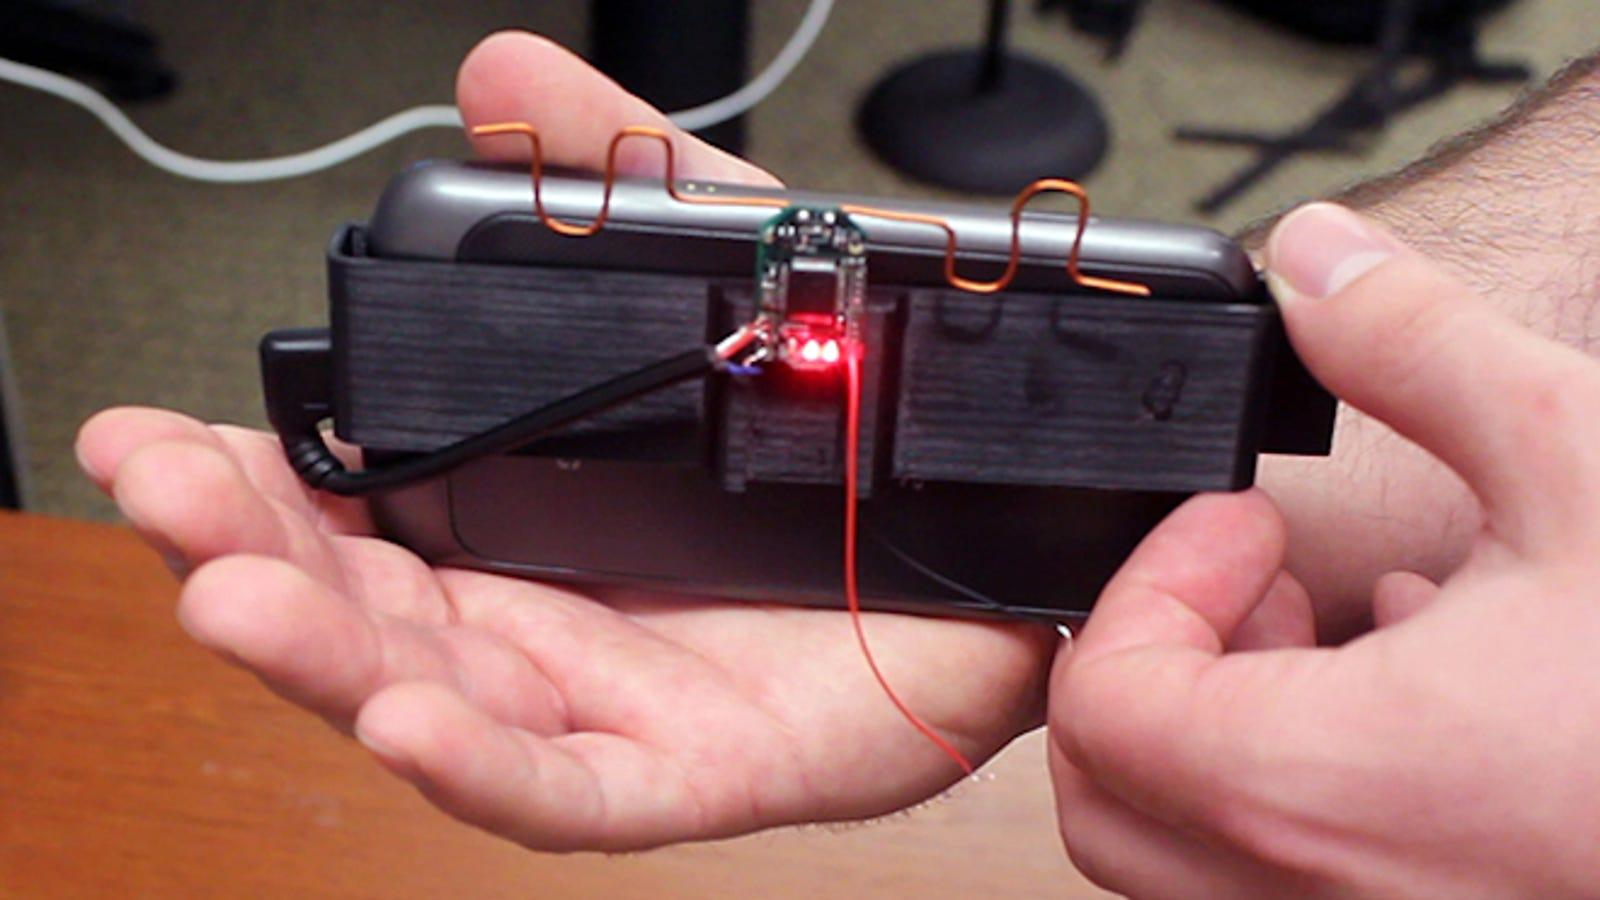 Este asombroso sensor de movimiento de 1 dólar funciona sin baterías